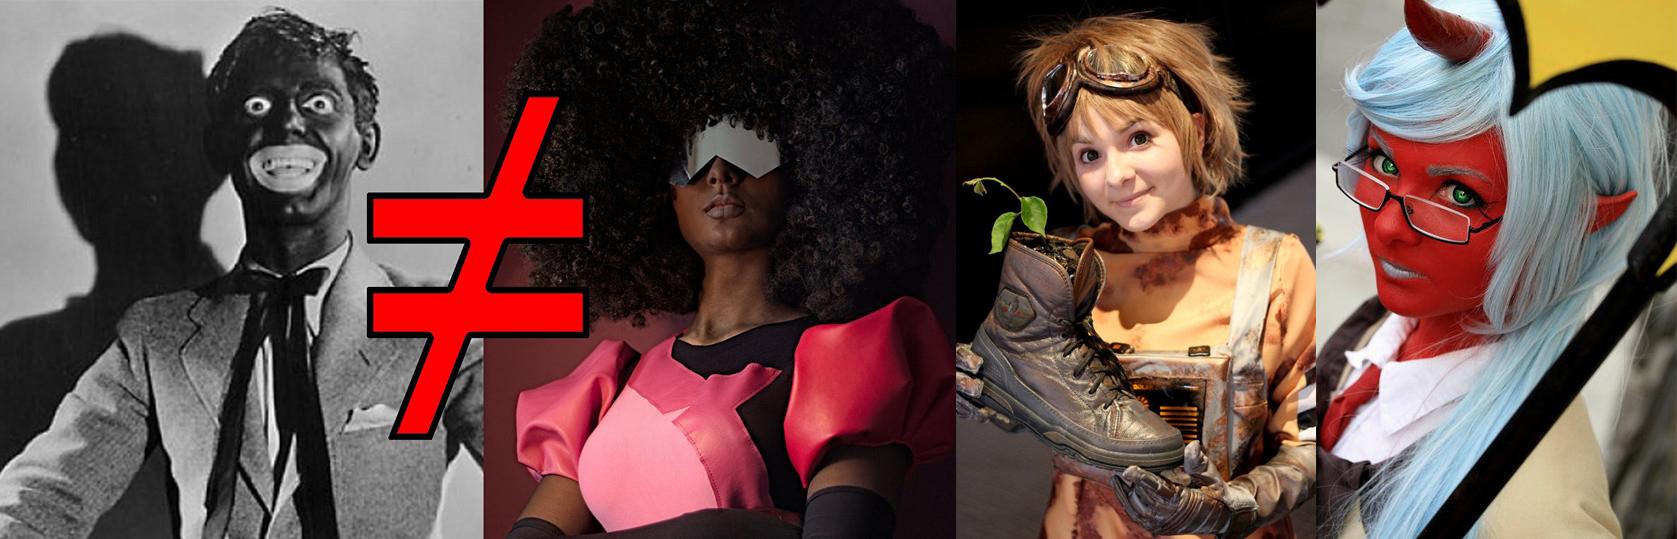 kou cosplay black racism